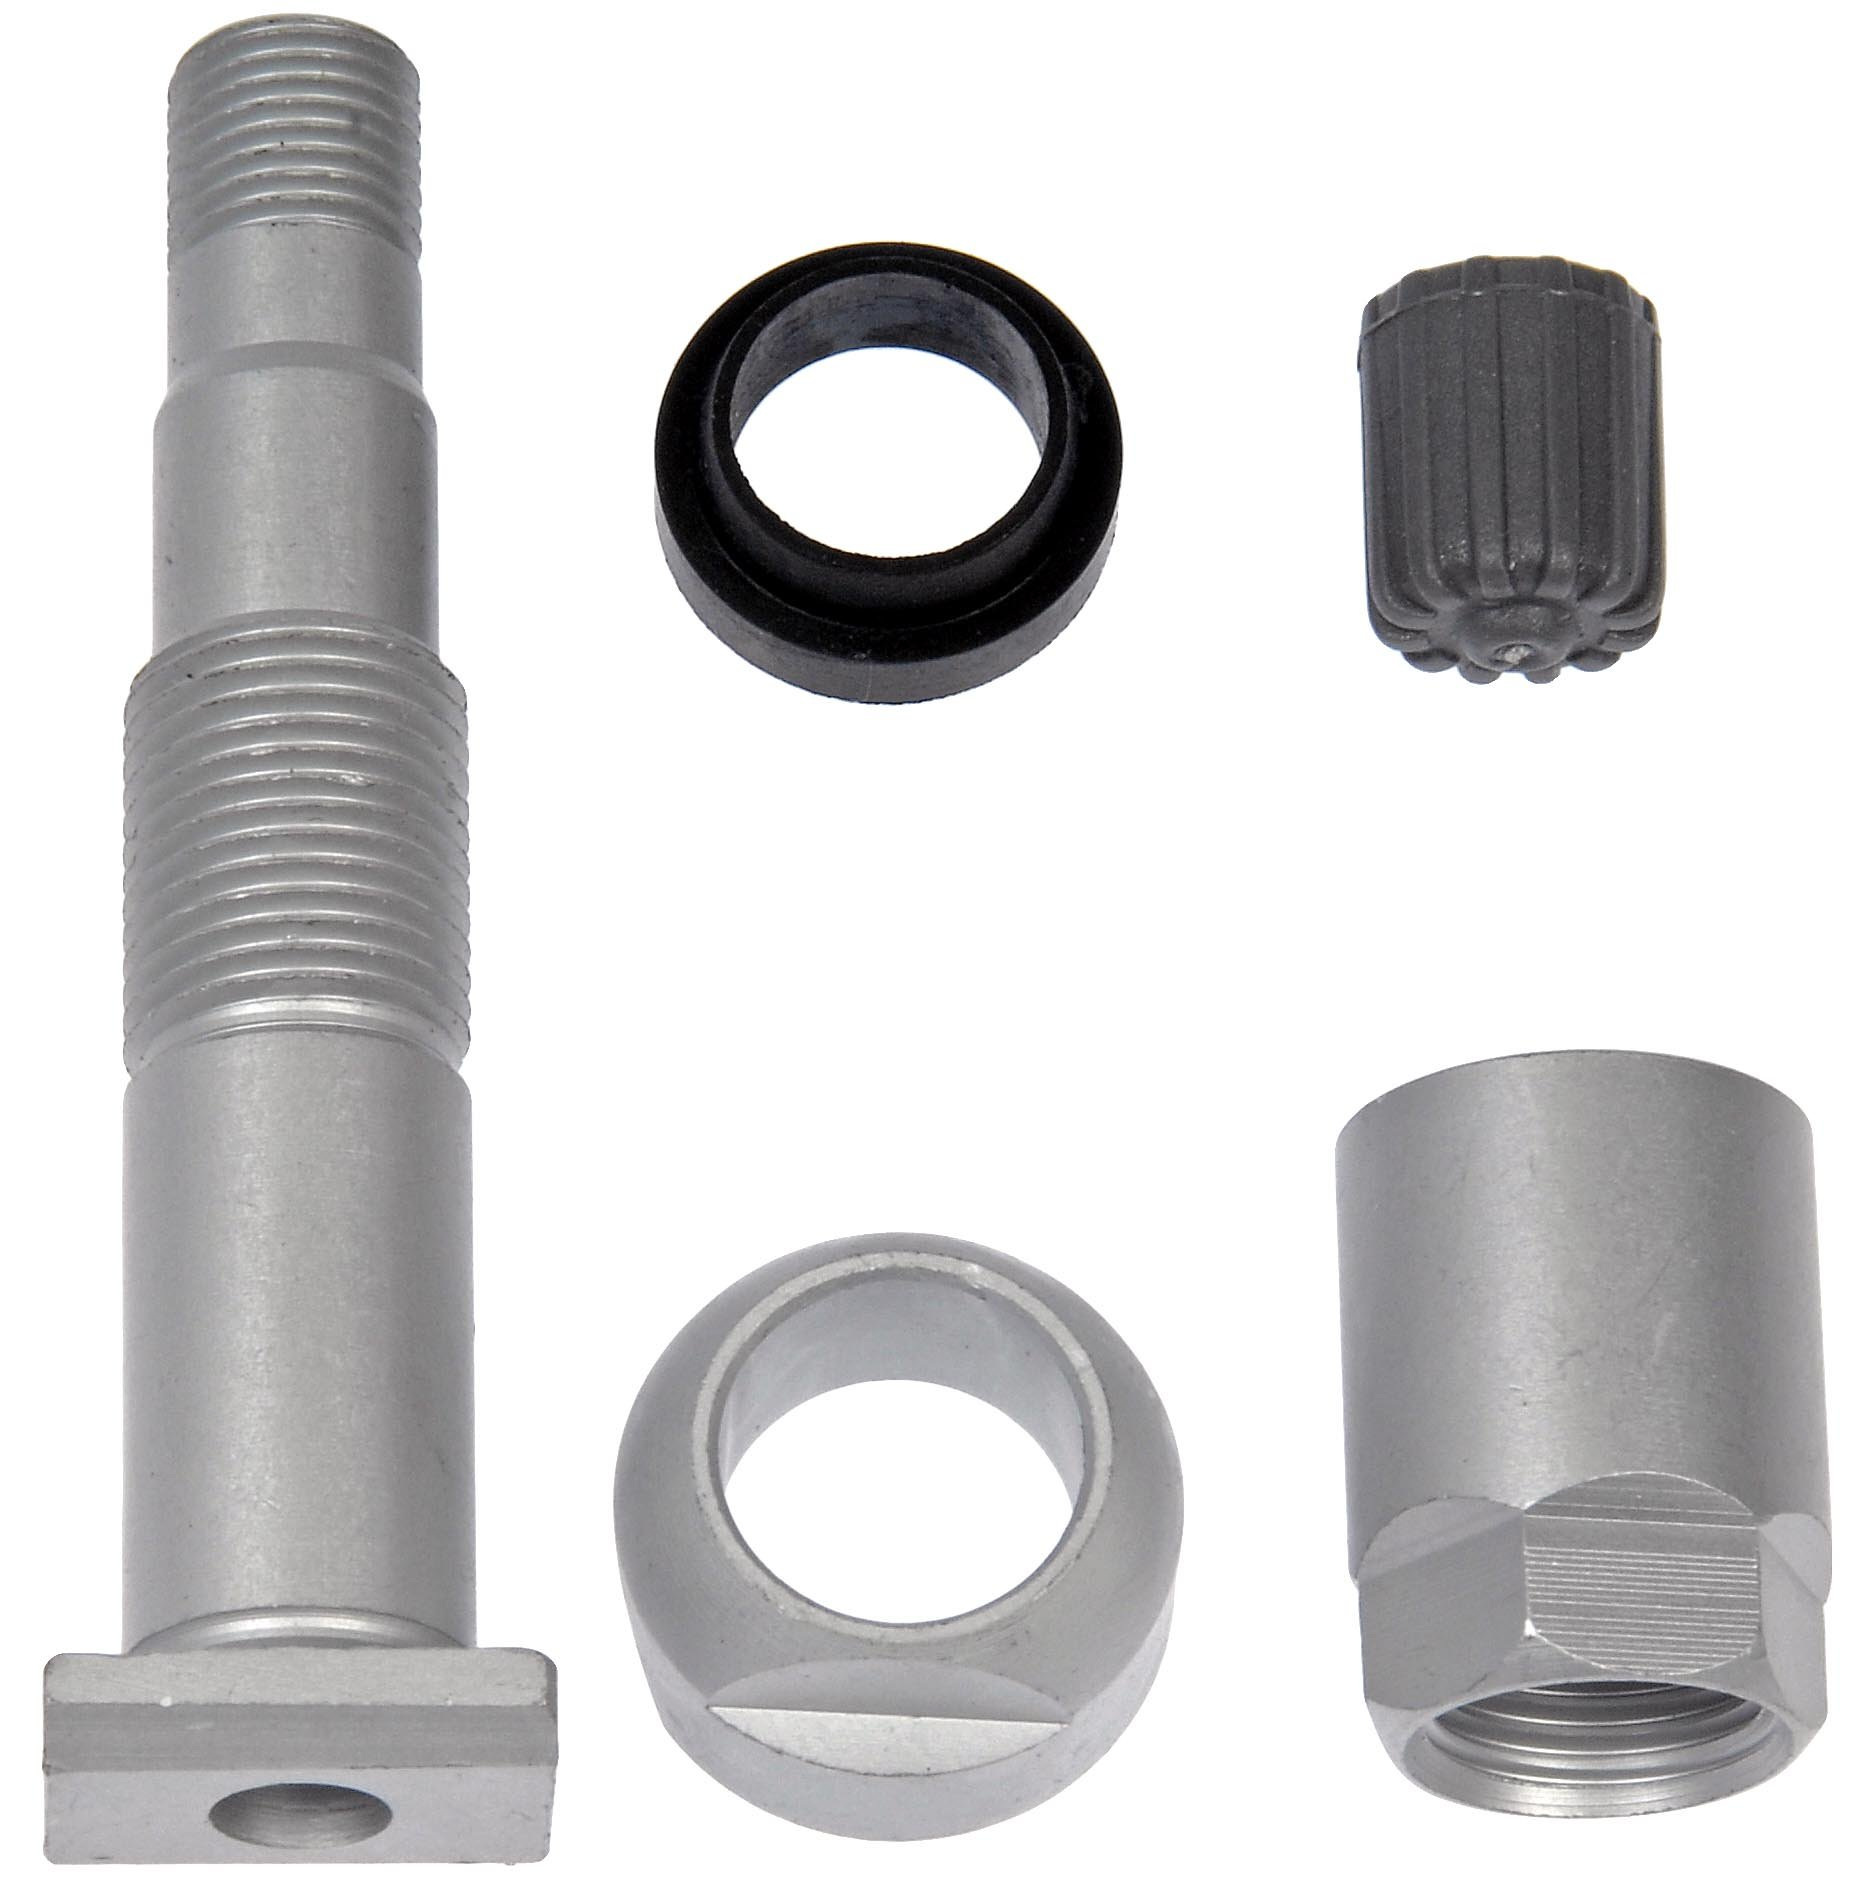 Dorman 609-142 Tire Pressure Monitoring System Valve Kit for Select Models